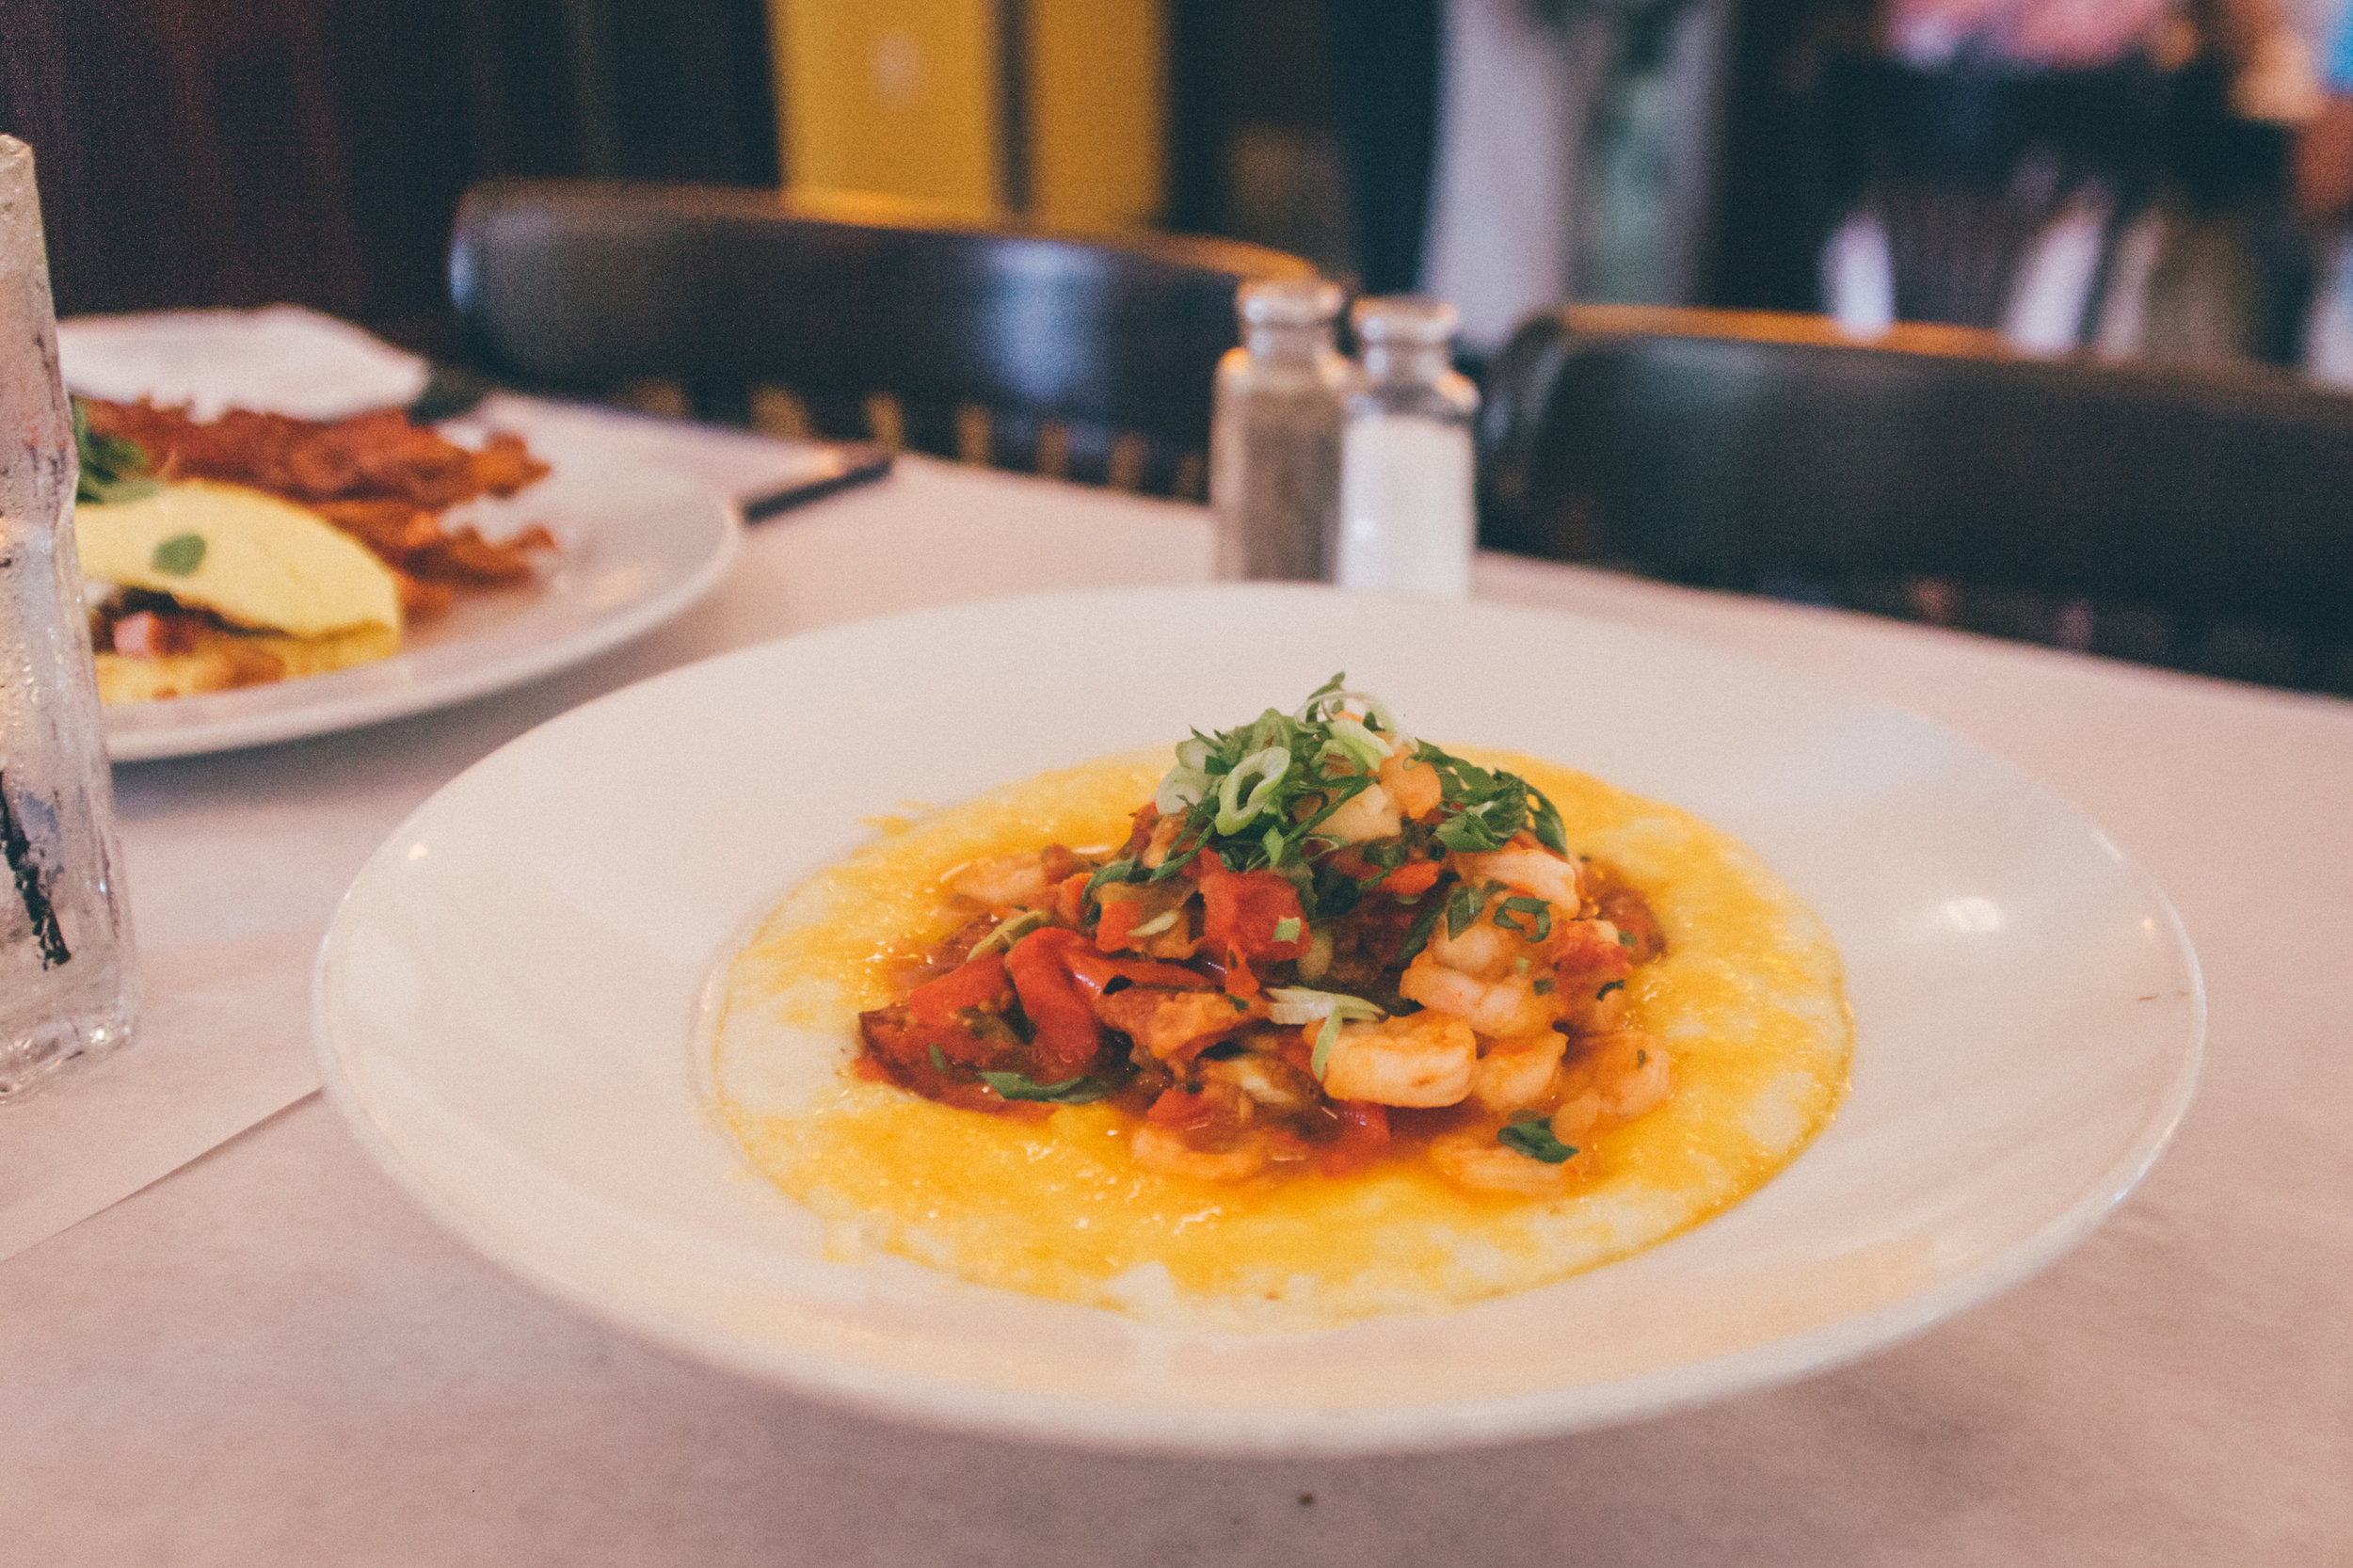 Andouille Sausage & Shrimp Ragout: Roasted pepper, caramelized onion, cheddar grits